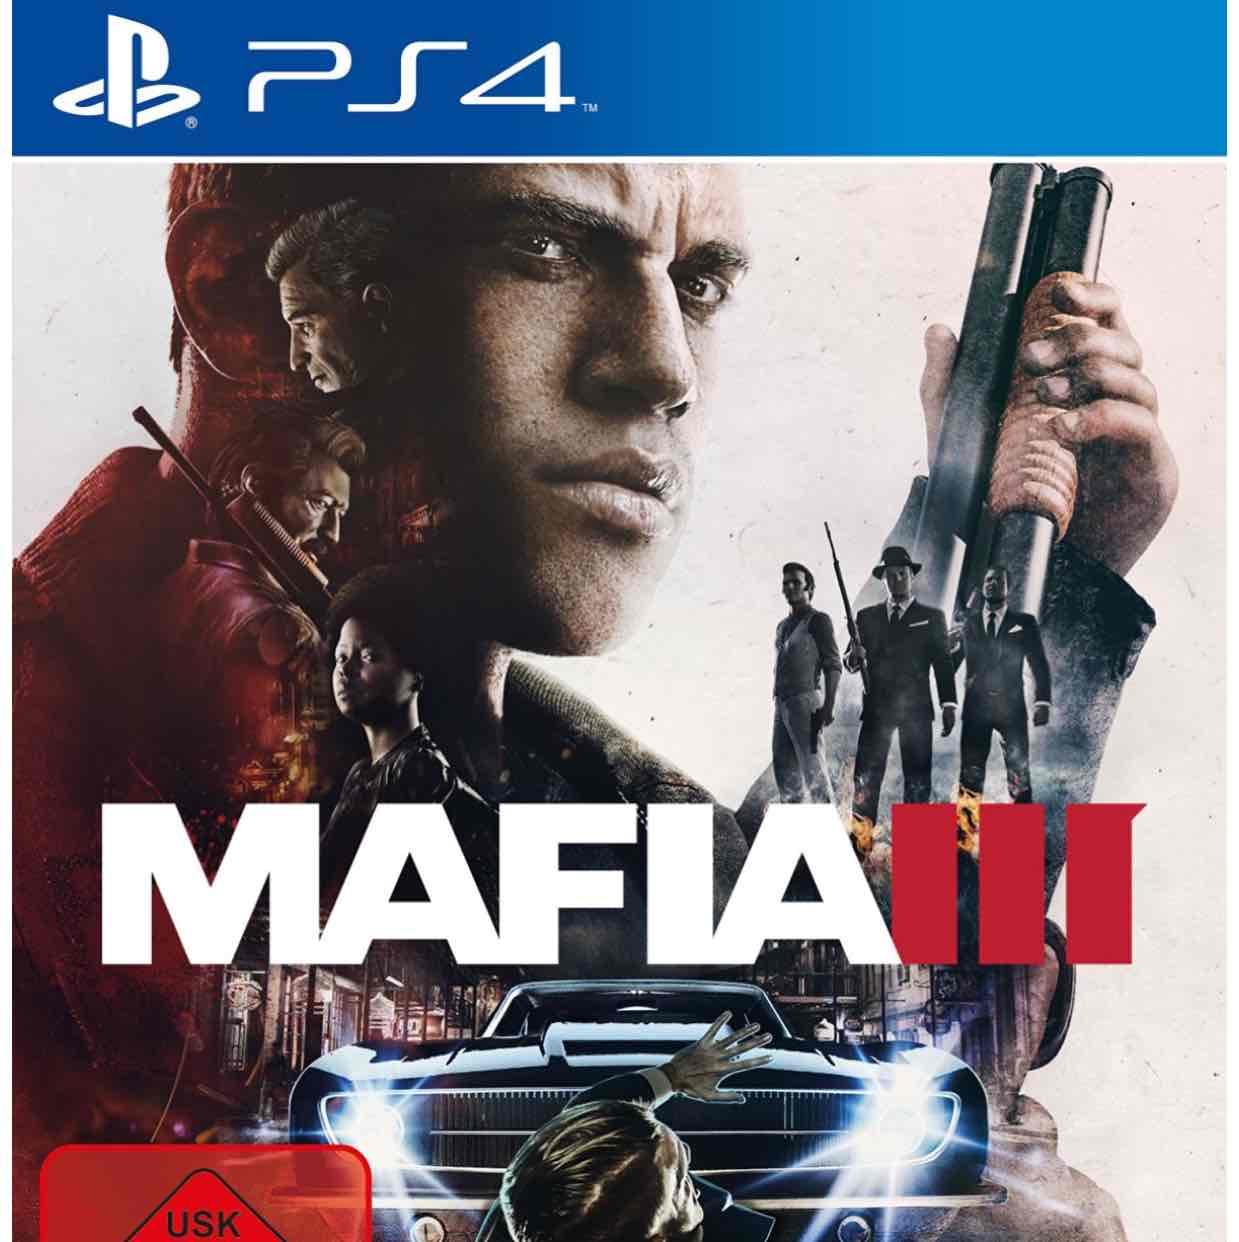 (ABGELAUFEN) Mafia 3 PS4 (30 Euro + 5 Euro Versand)